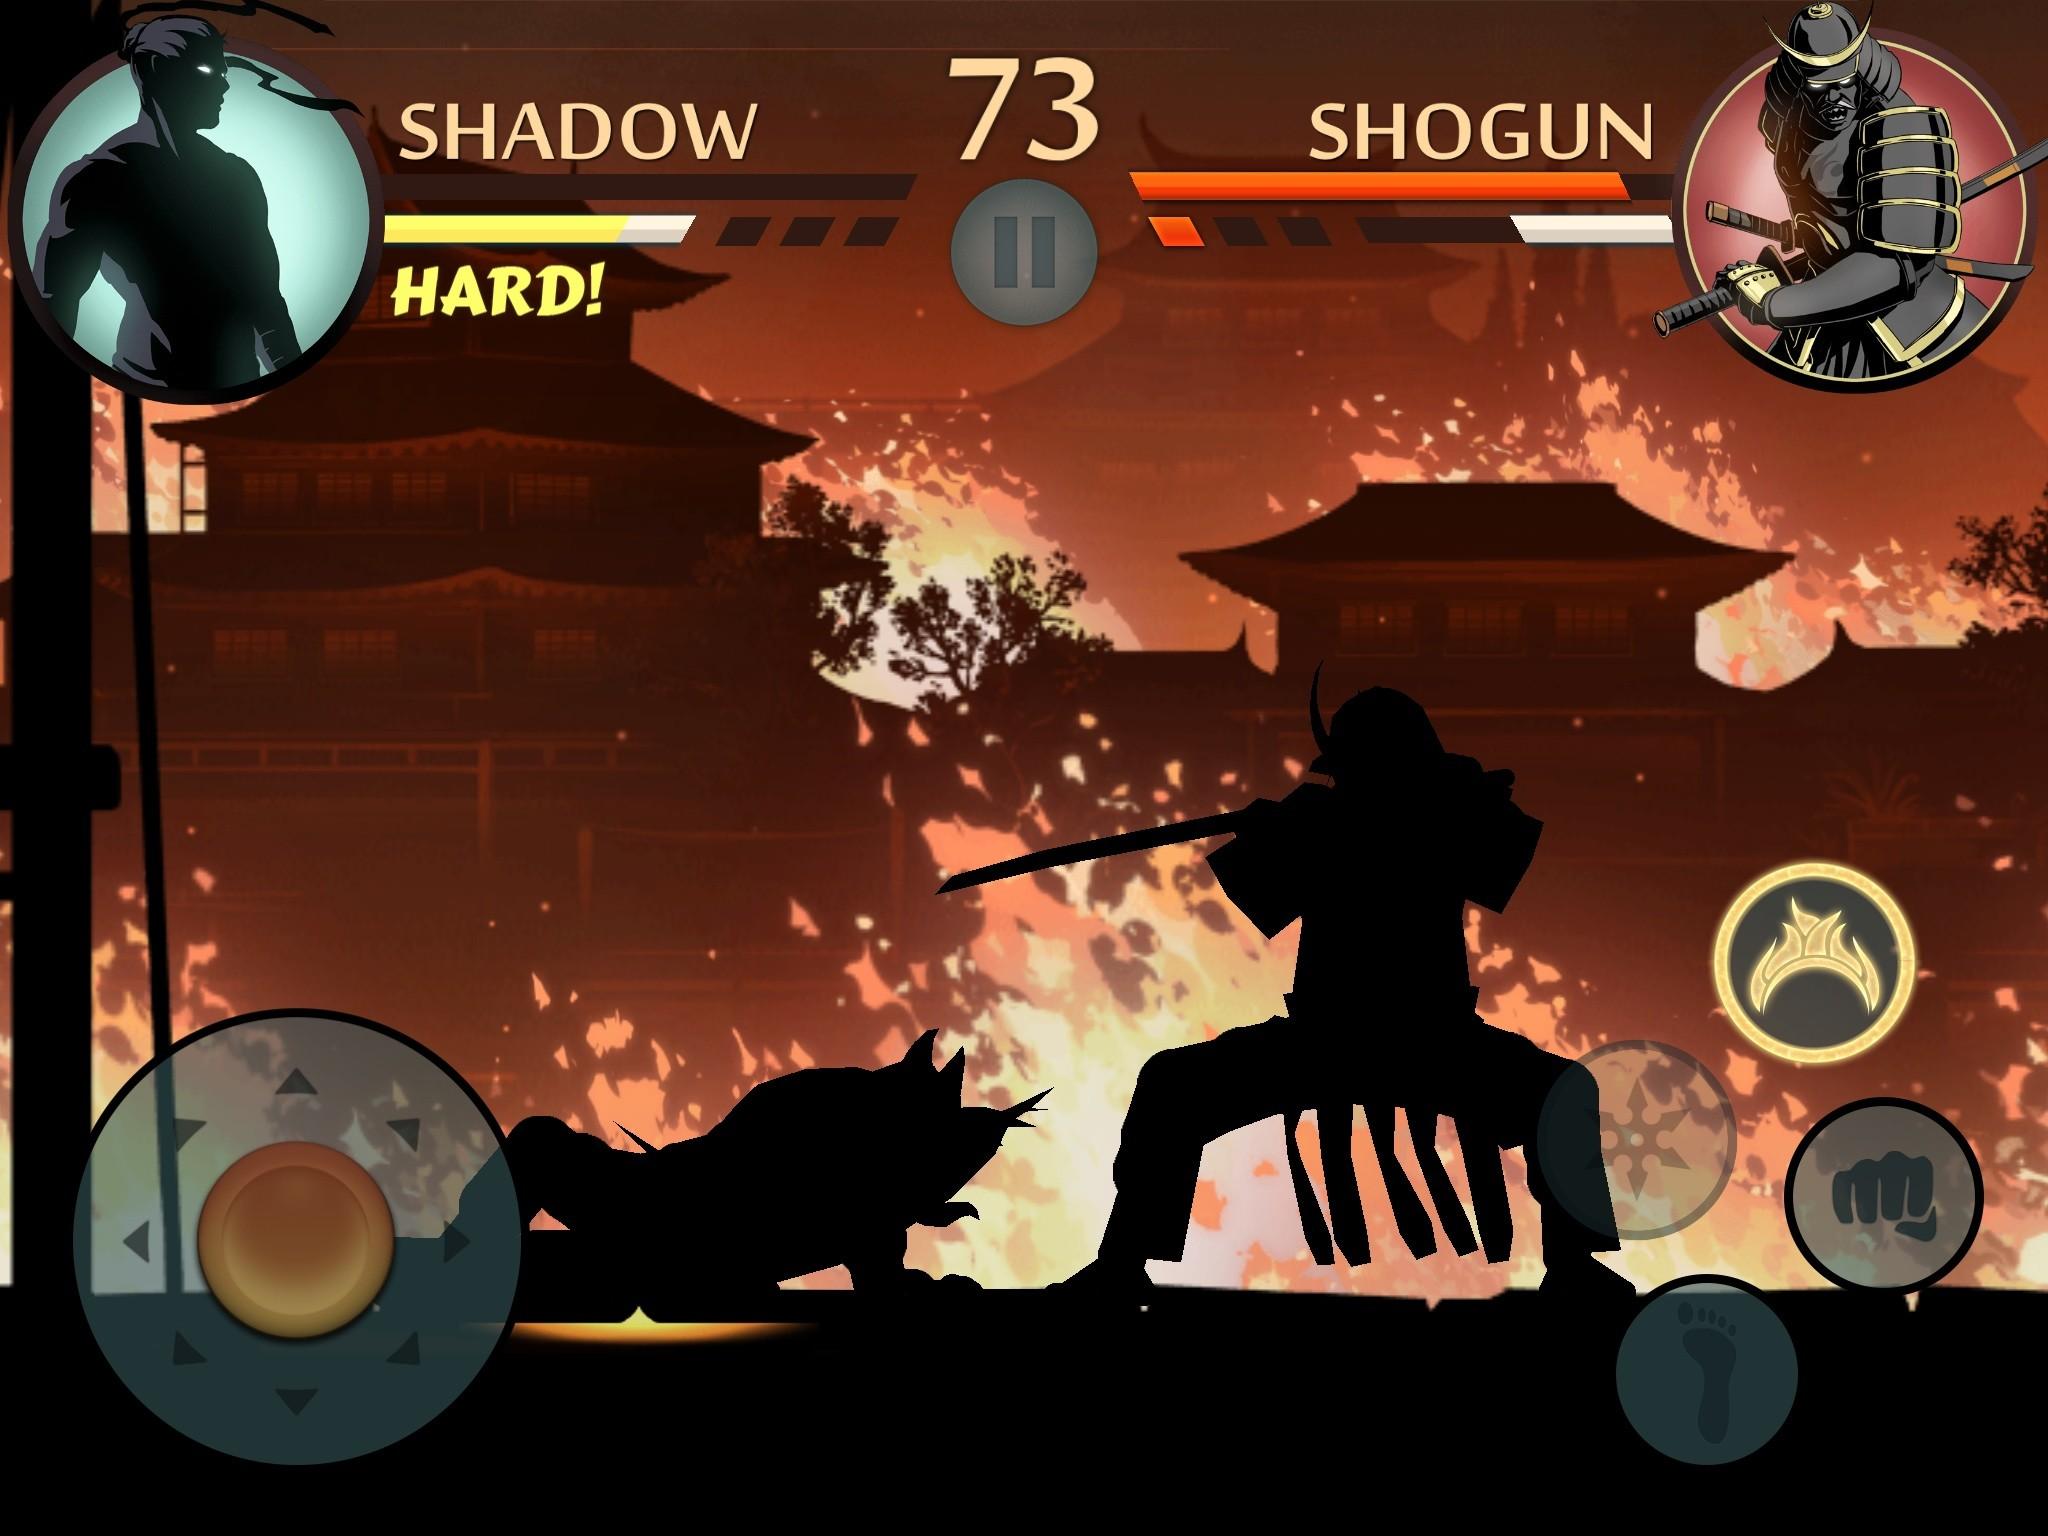 Res: 2048x1536, Shogun Boss Fight.jpg